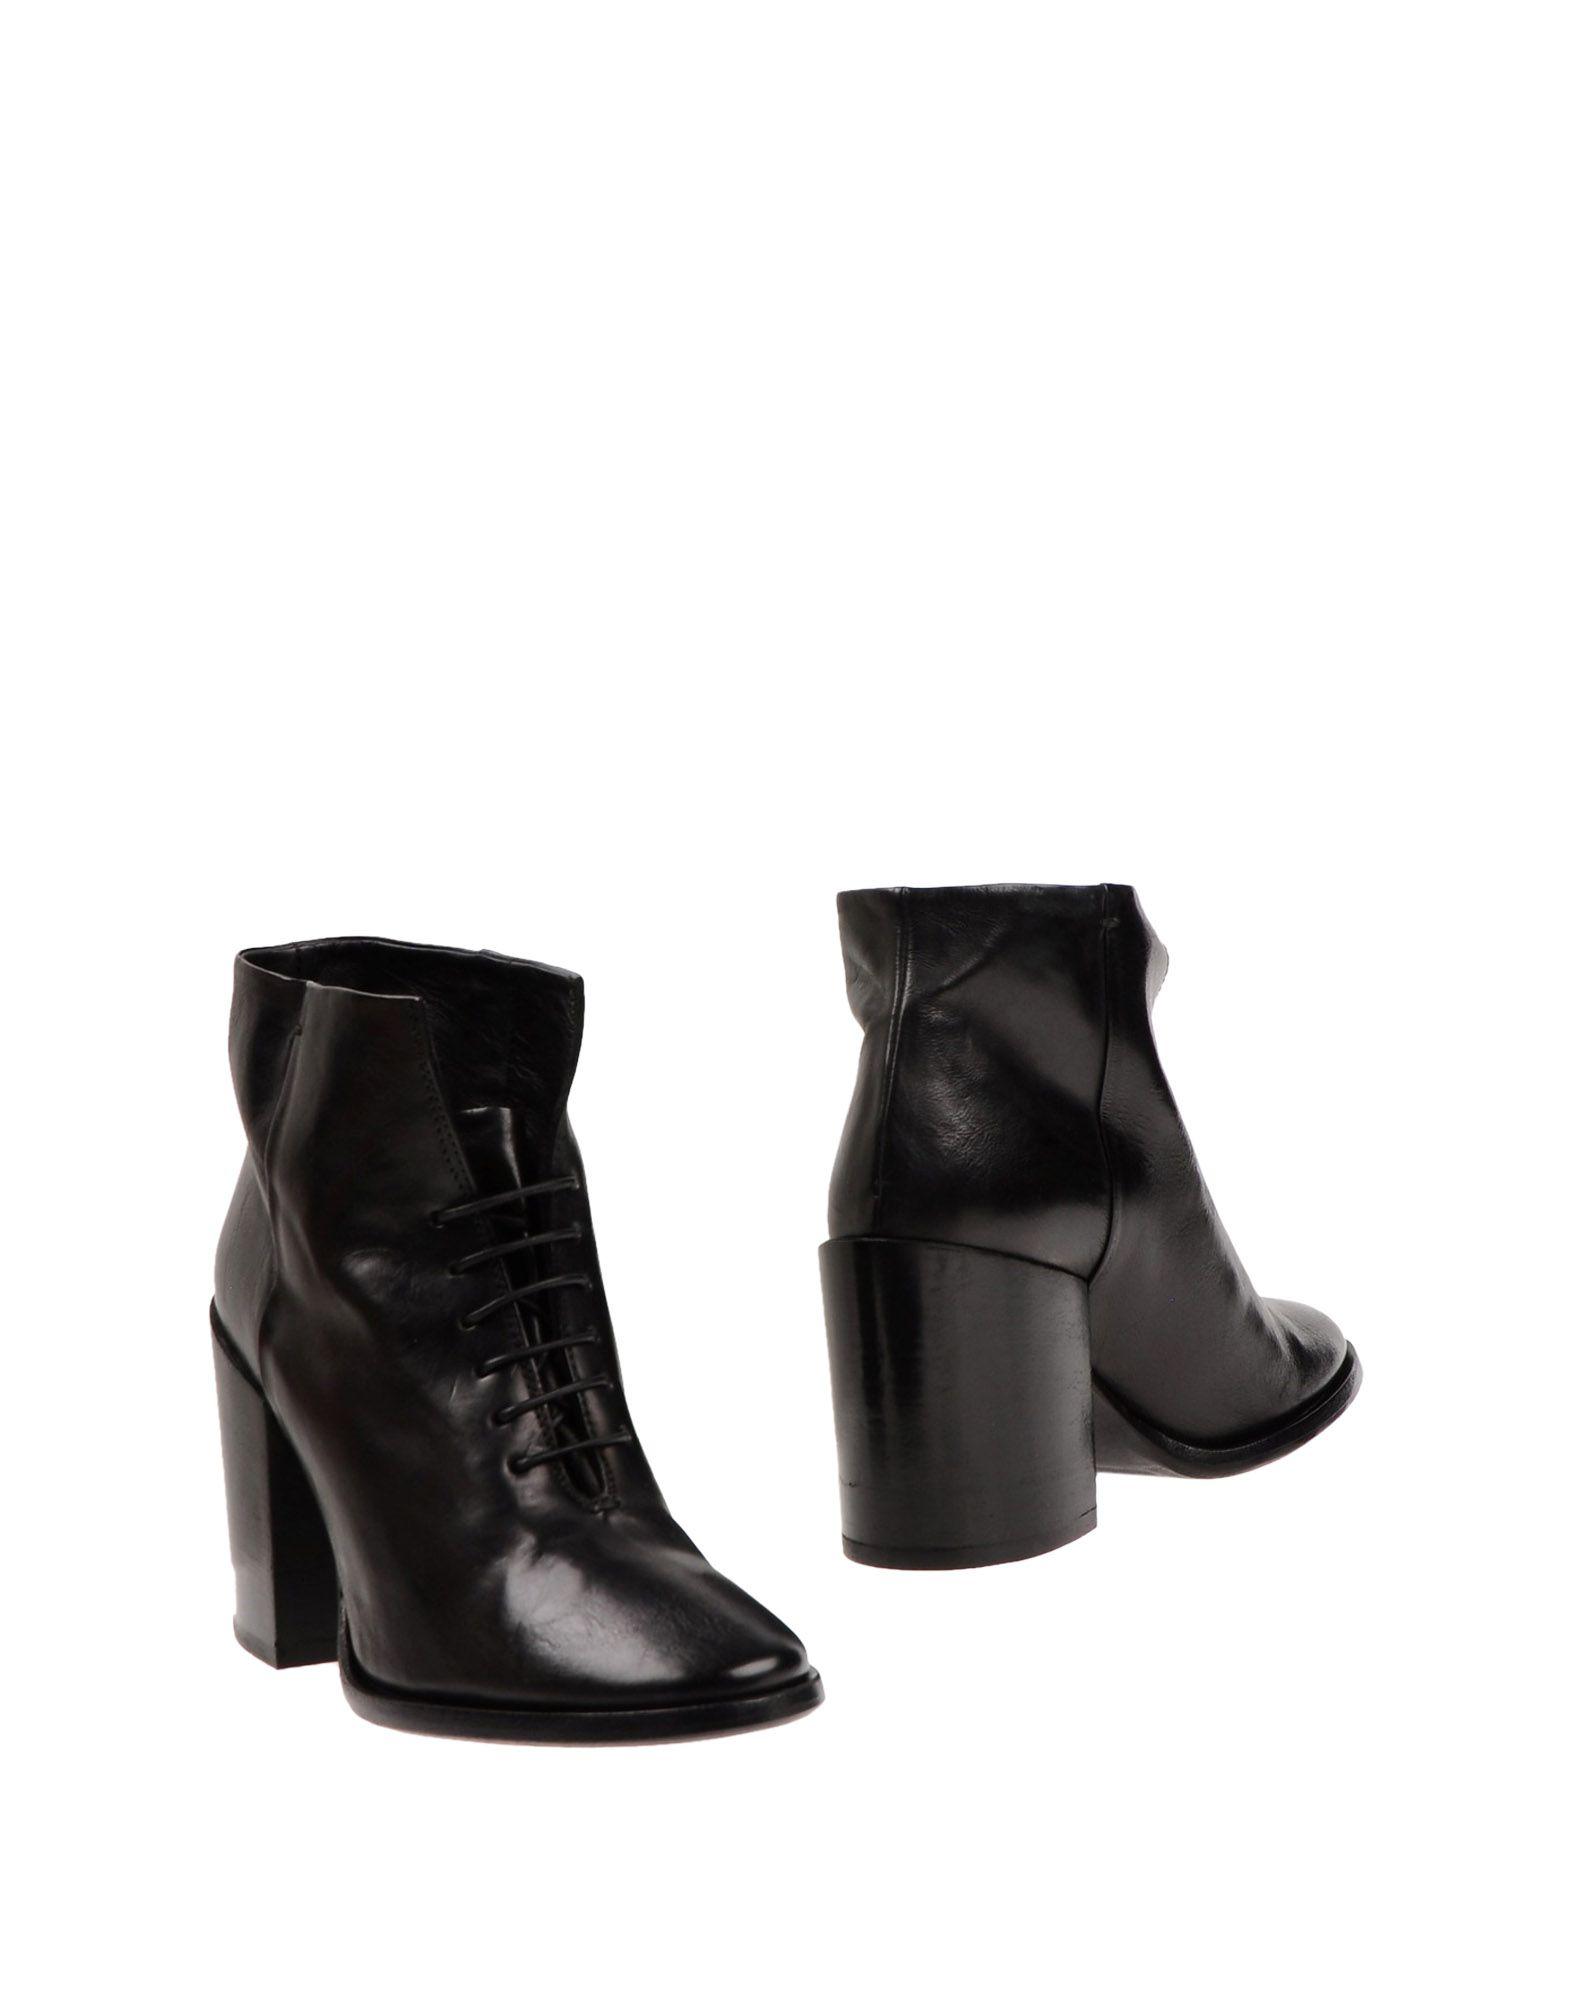 ФОТО preventi полусапоги и высокие ботинки